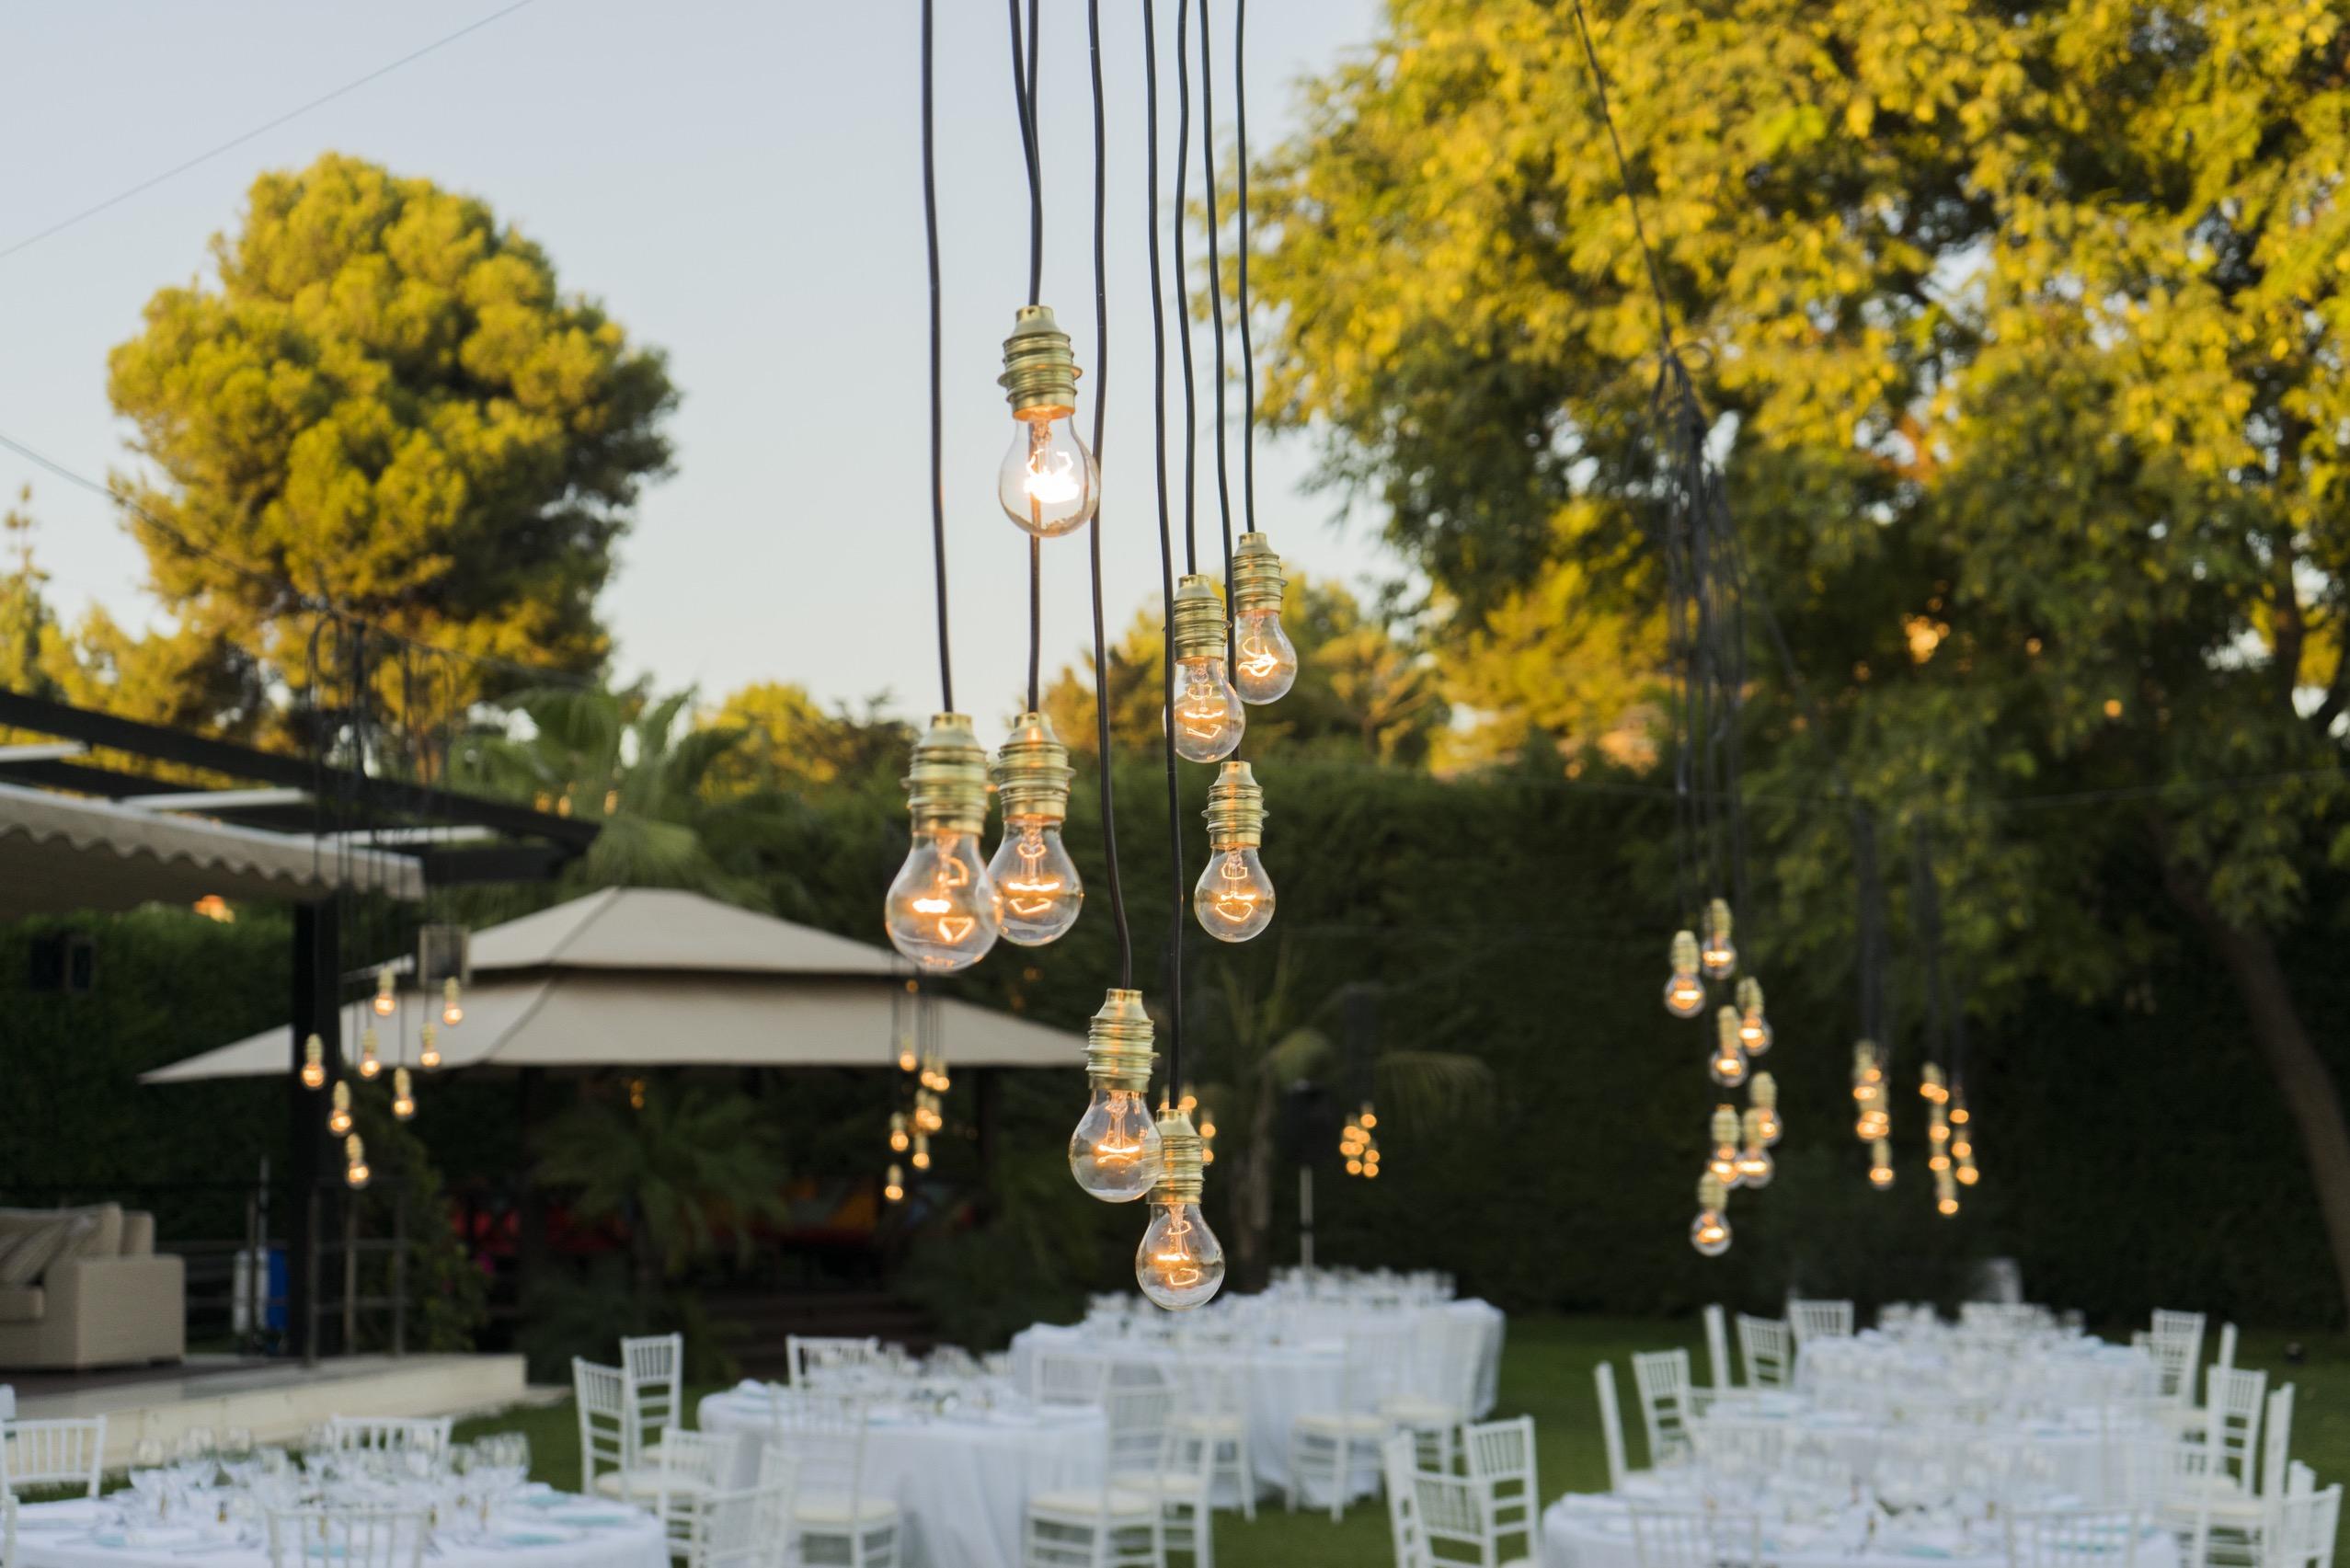 Si-Quiero-Wedding-Planner-By-Sira-Antequera-Bodas-Málaga-Marbella-Miami- Nicole-Guille-3